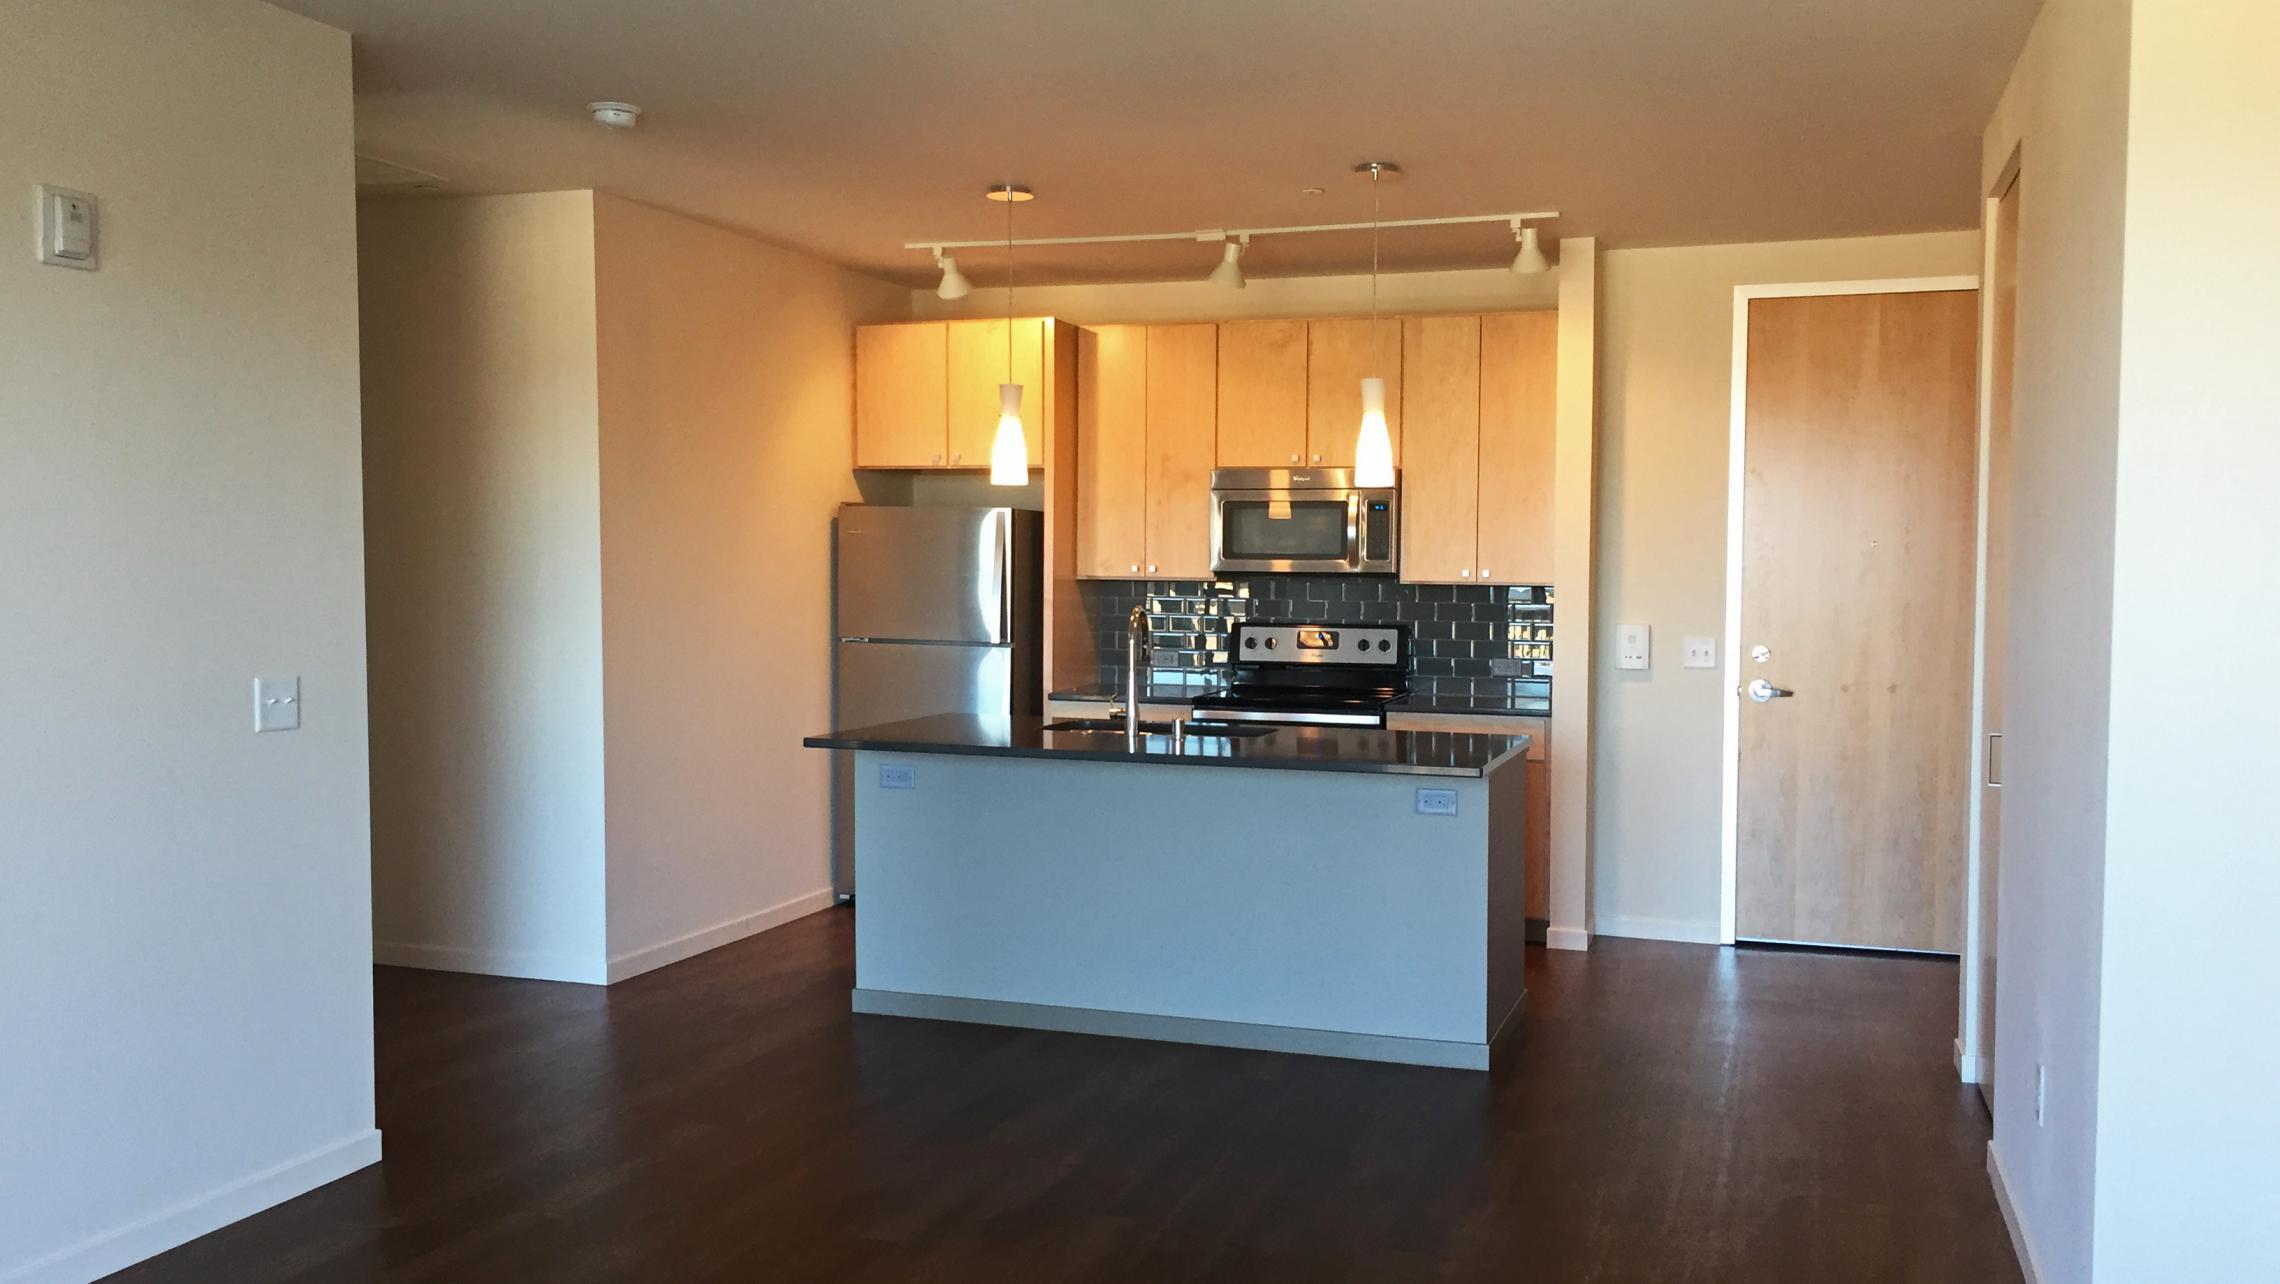 ULI Nine Line Apartment 216 - Kitchen